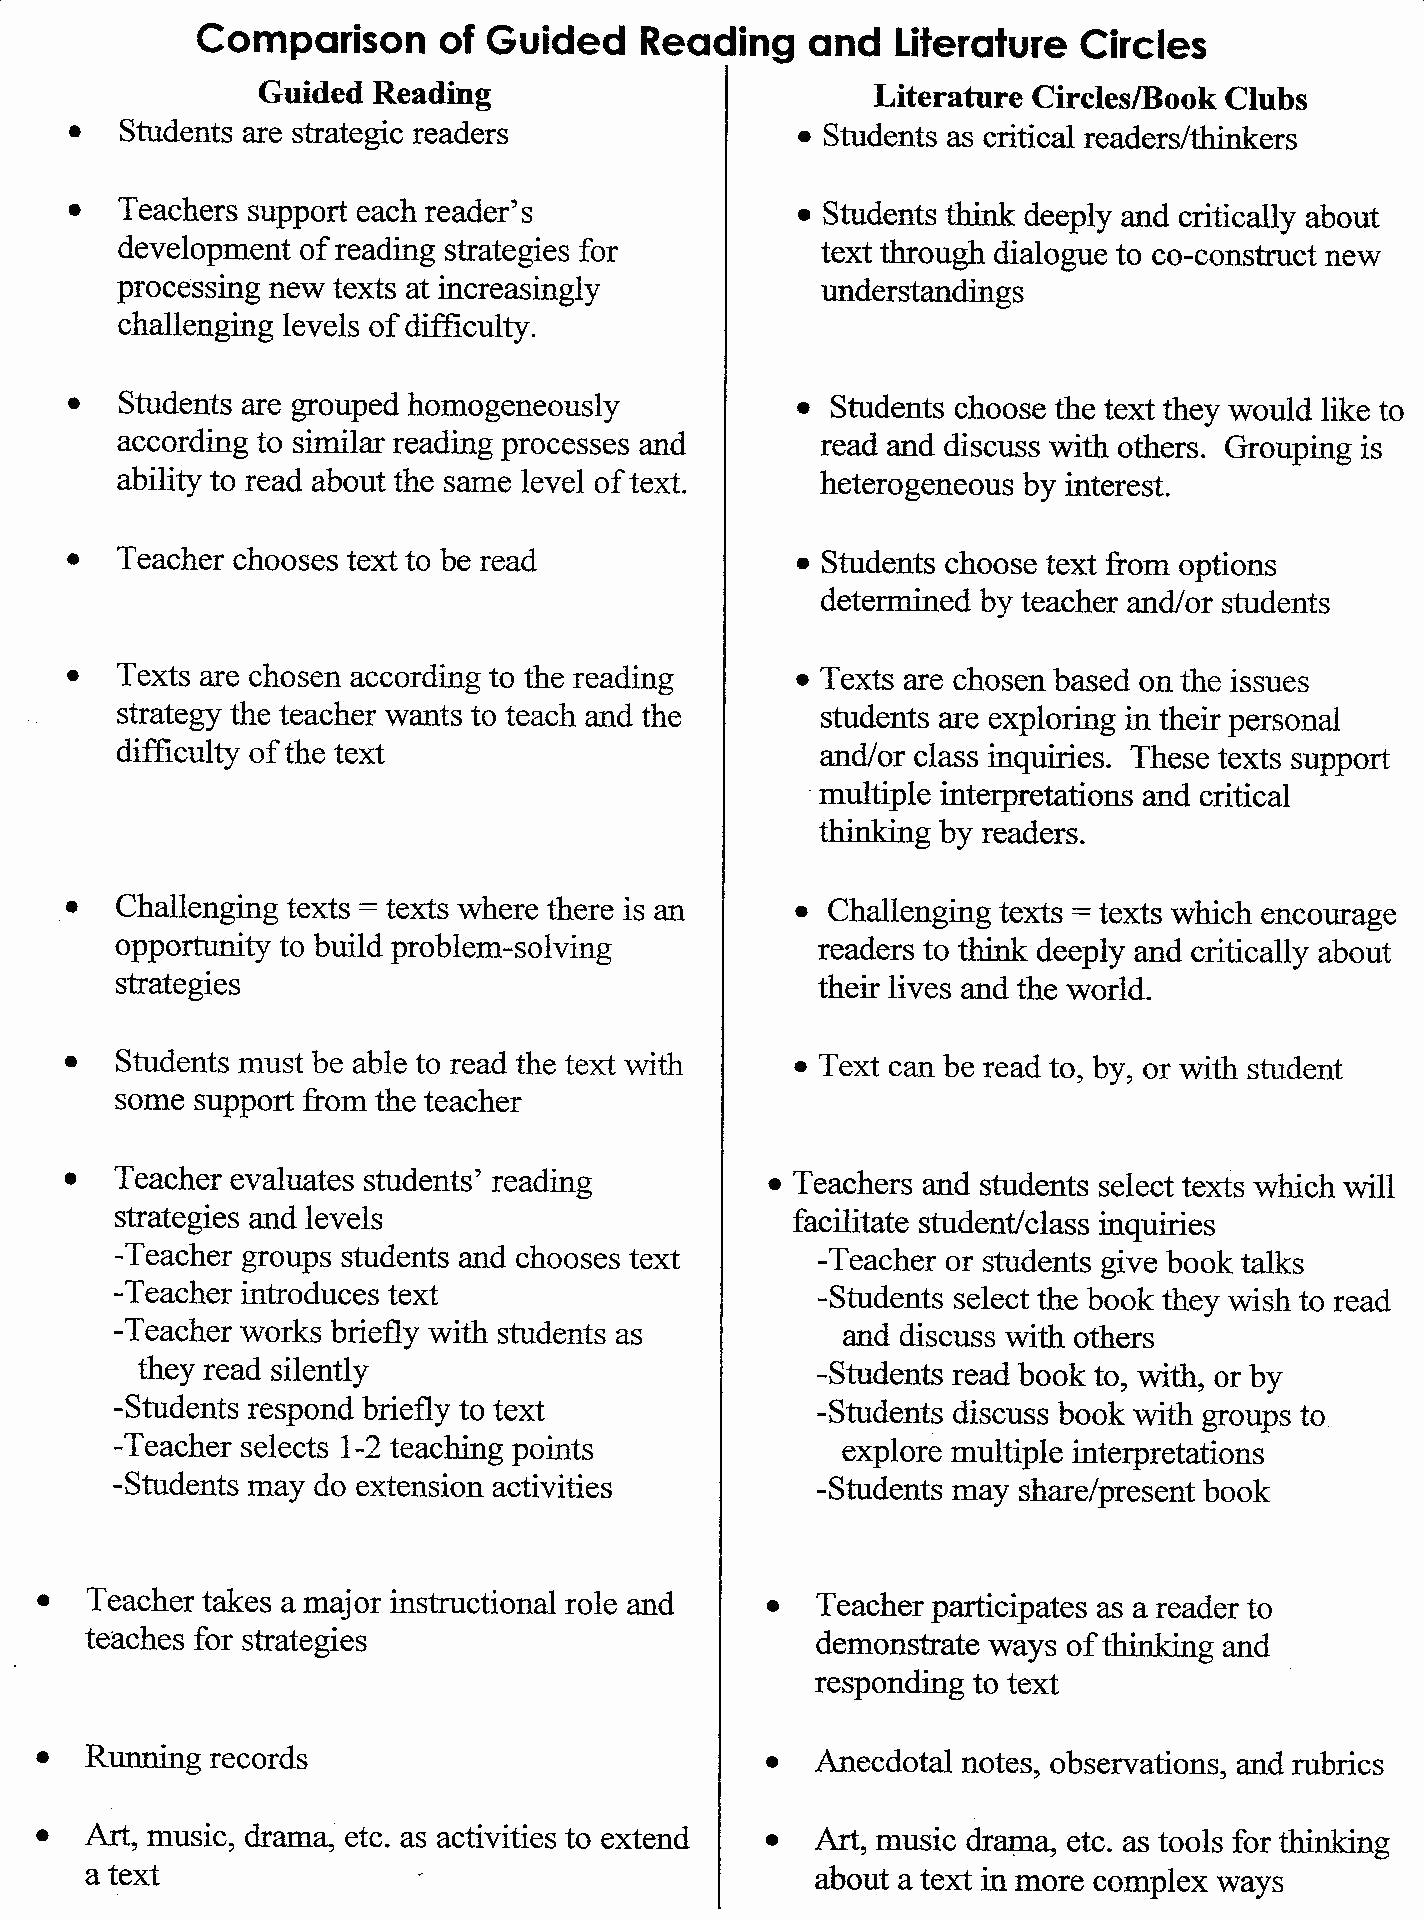 Suffix Worksheets 4th Grade Best Of Prefixes and Suffixes Worksheets 4th Grade